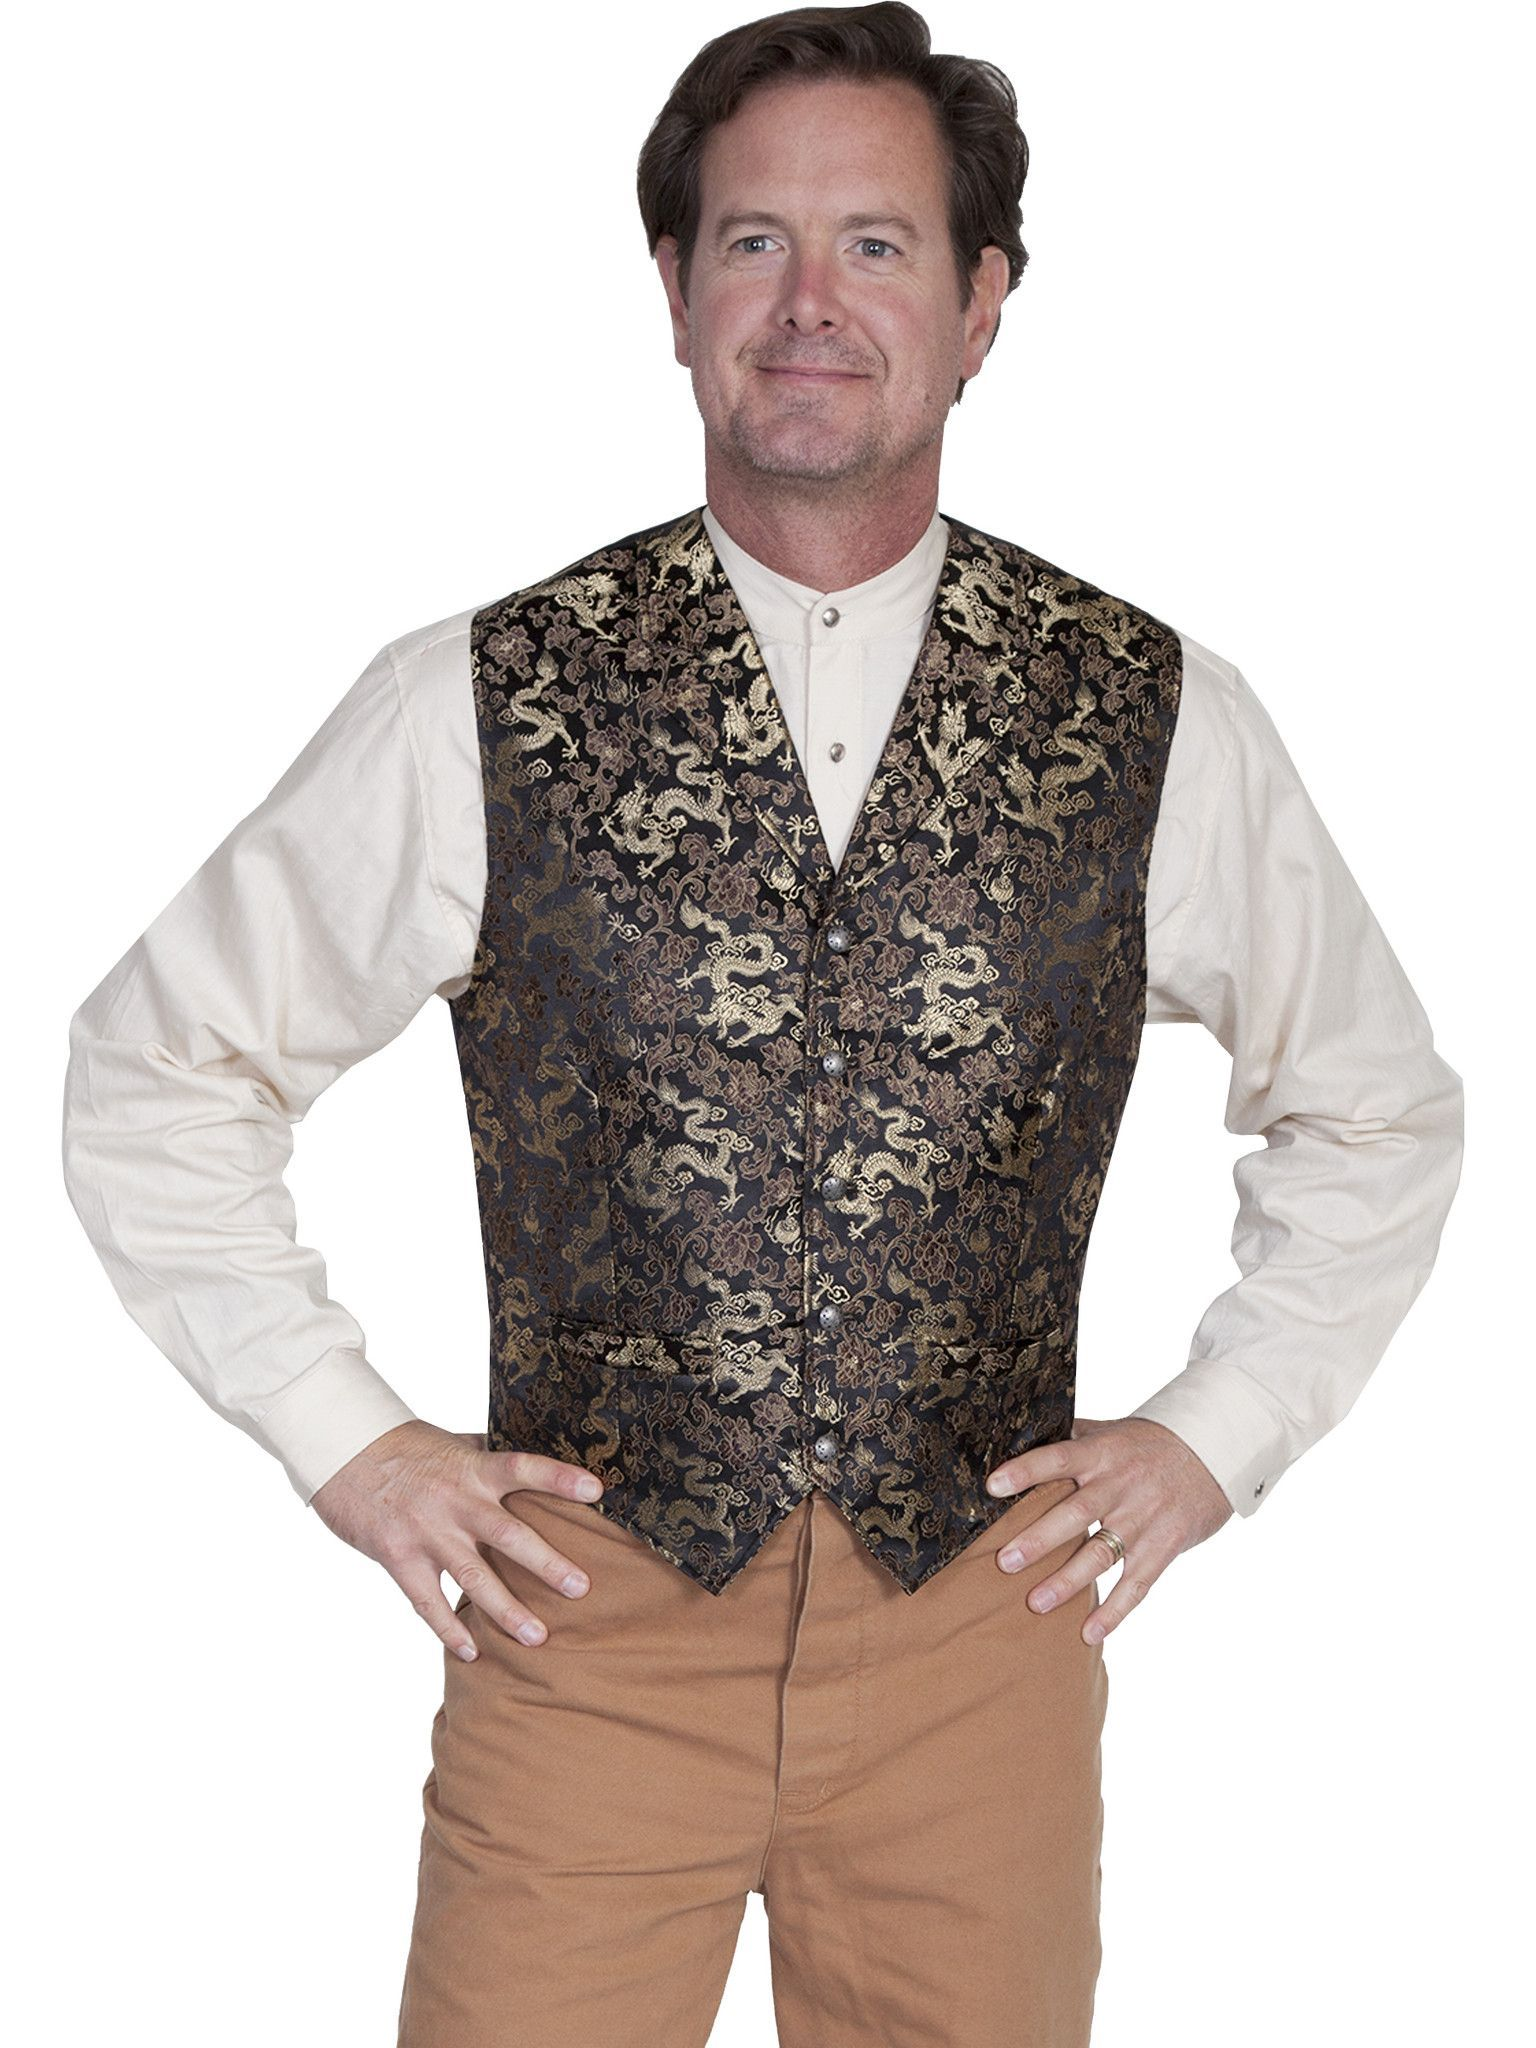 Old West Collection Vest: Wahmaker Fancy Classic Dragon Gold